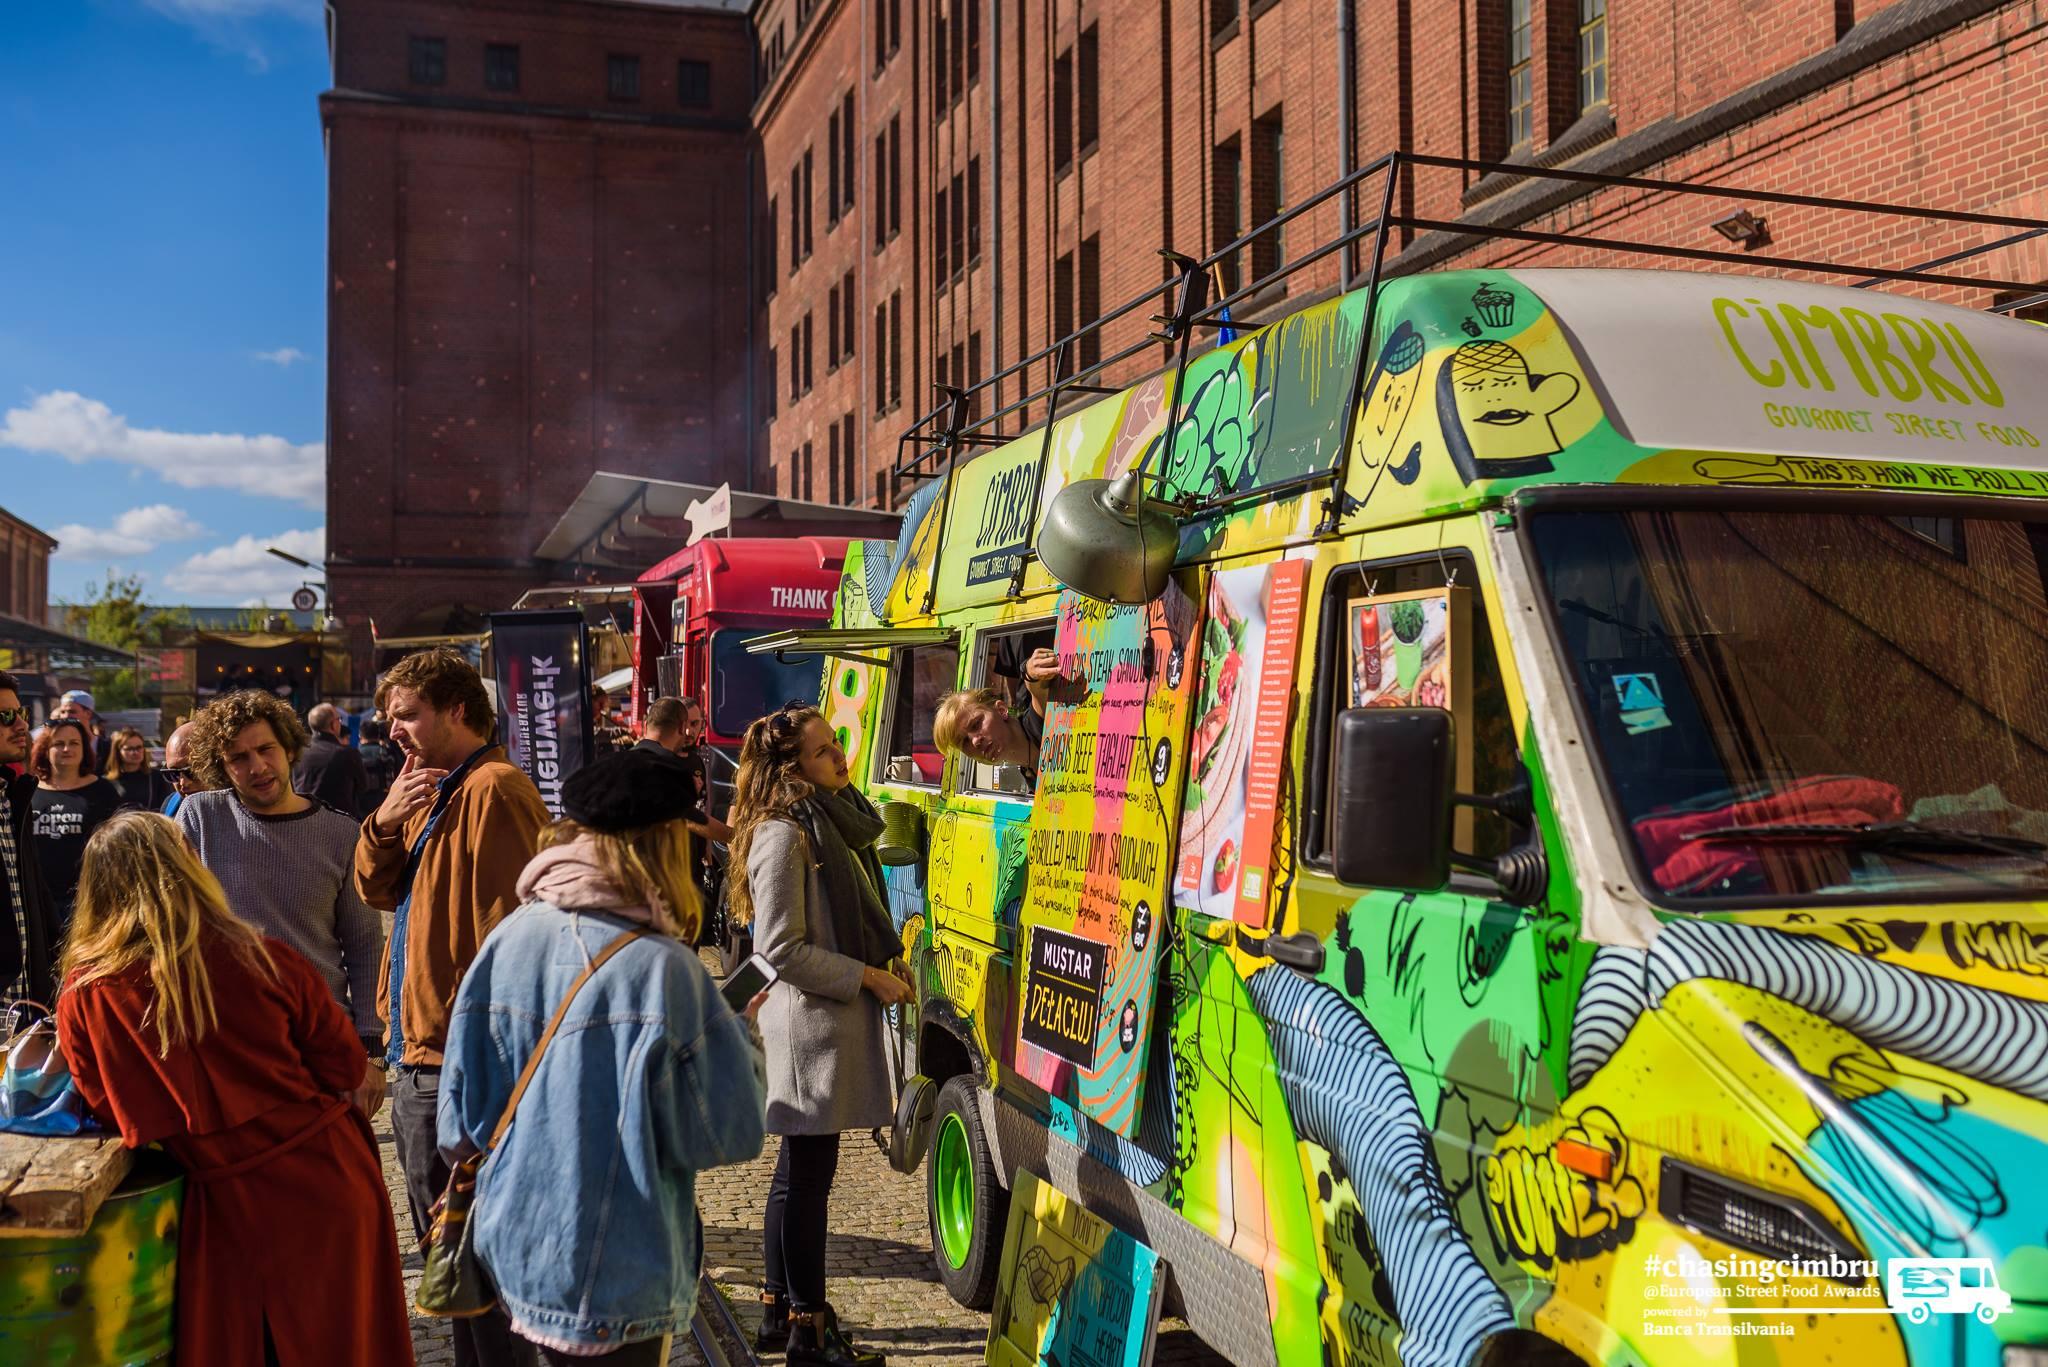 Cum a fost la European Street Food Awards cu echipa Cimbru